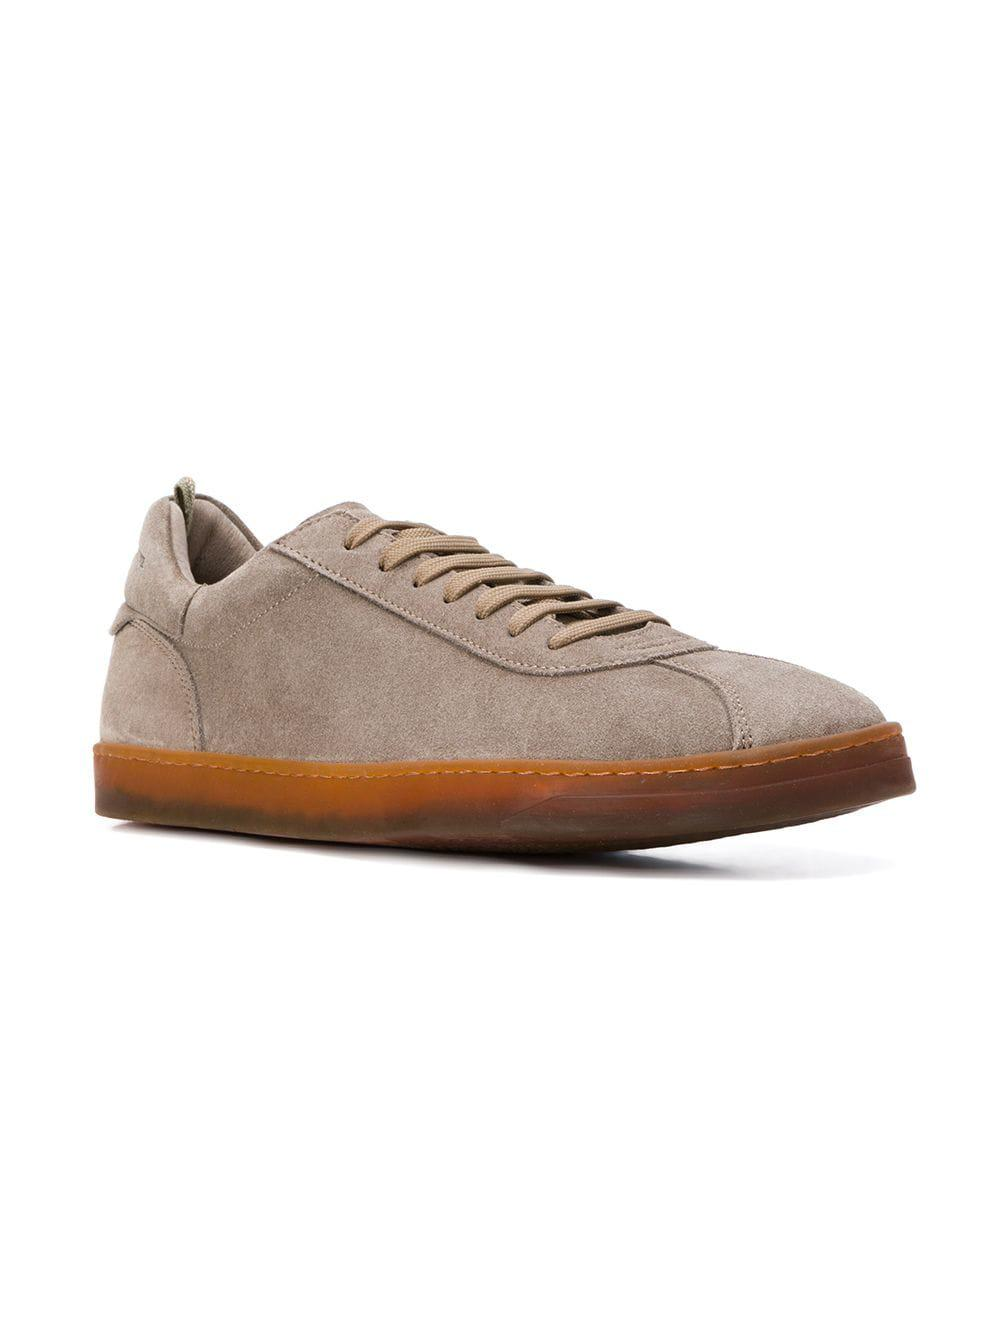 half off 73821 6e47b officine-creative-neutrals-Karma-Sneakers.jpeg